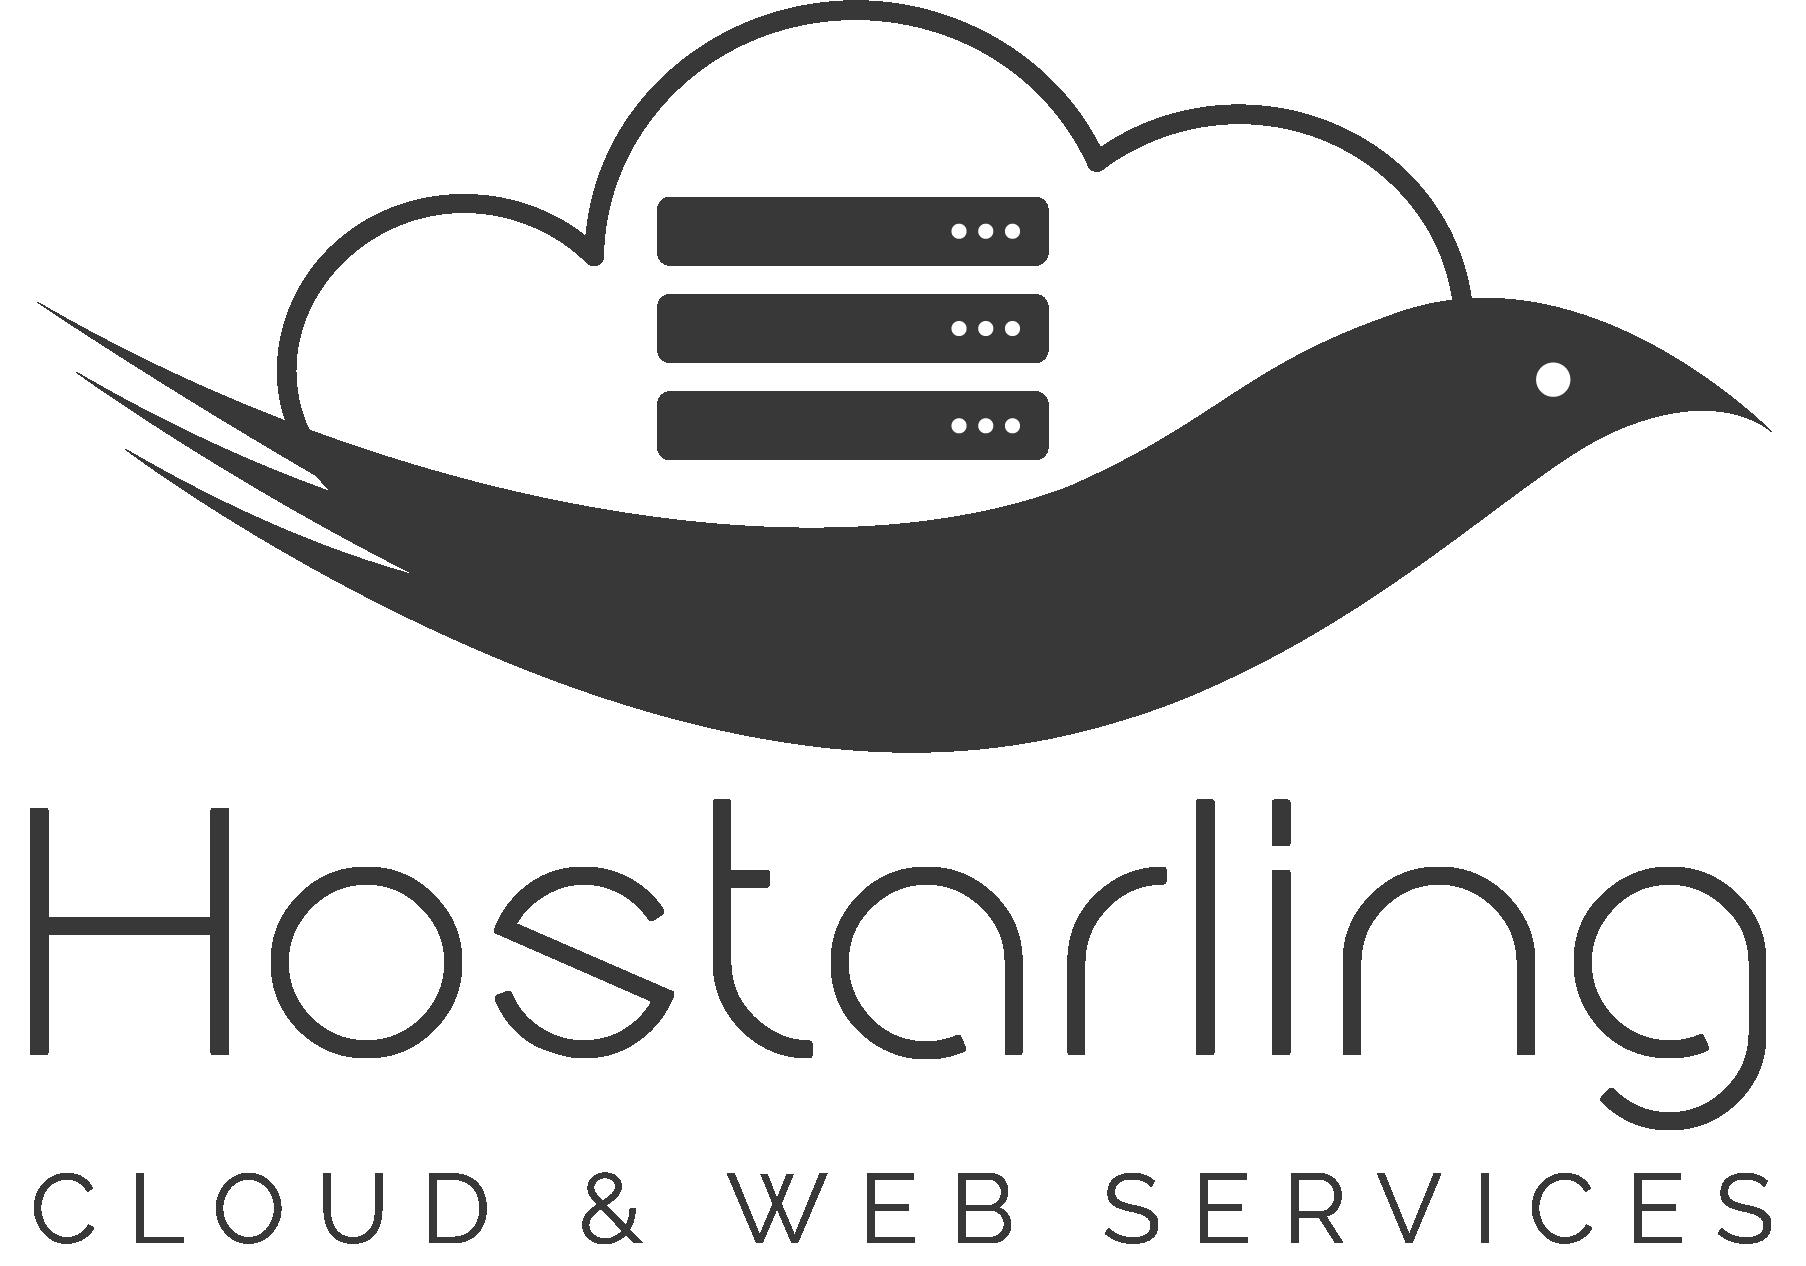 Hostarling #1st Cloud Services